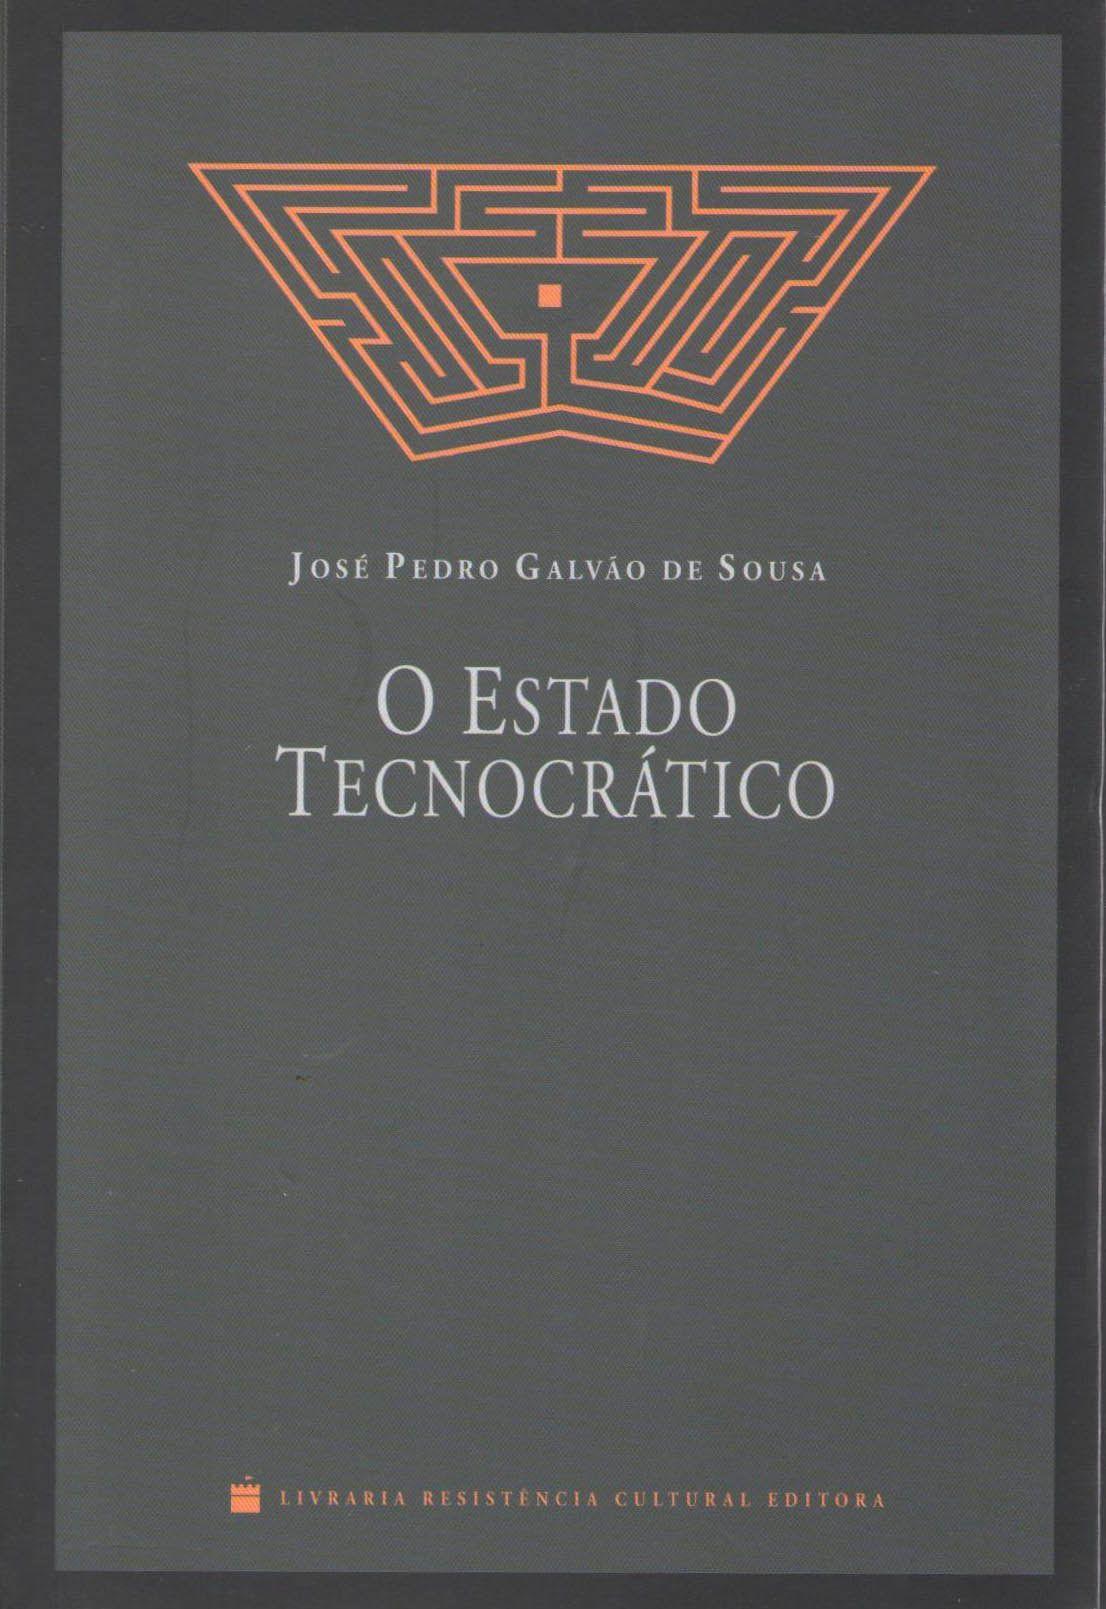 O Estado tecnocrático - José Pedro Galvão de Souza